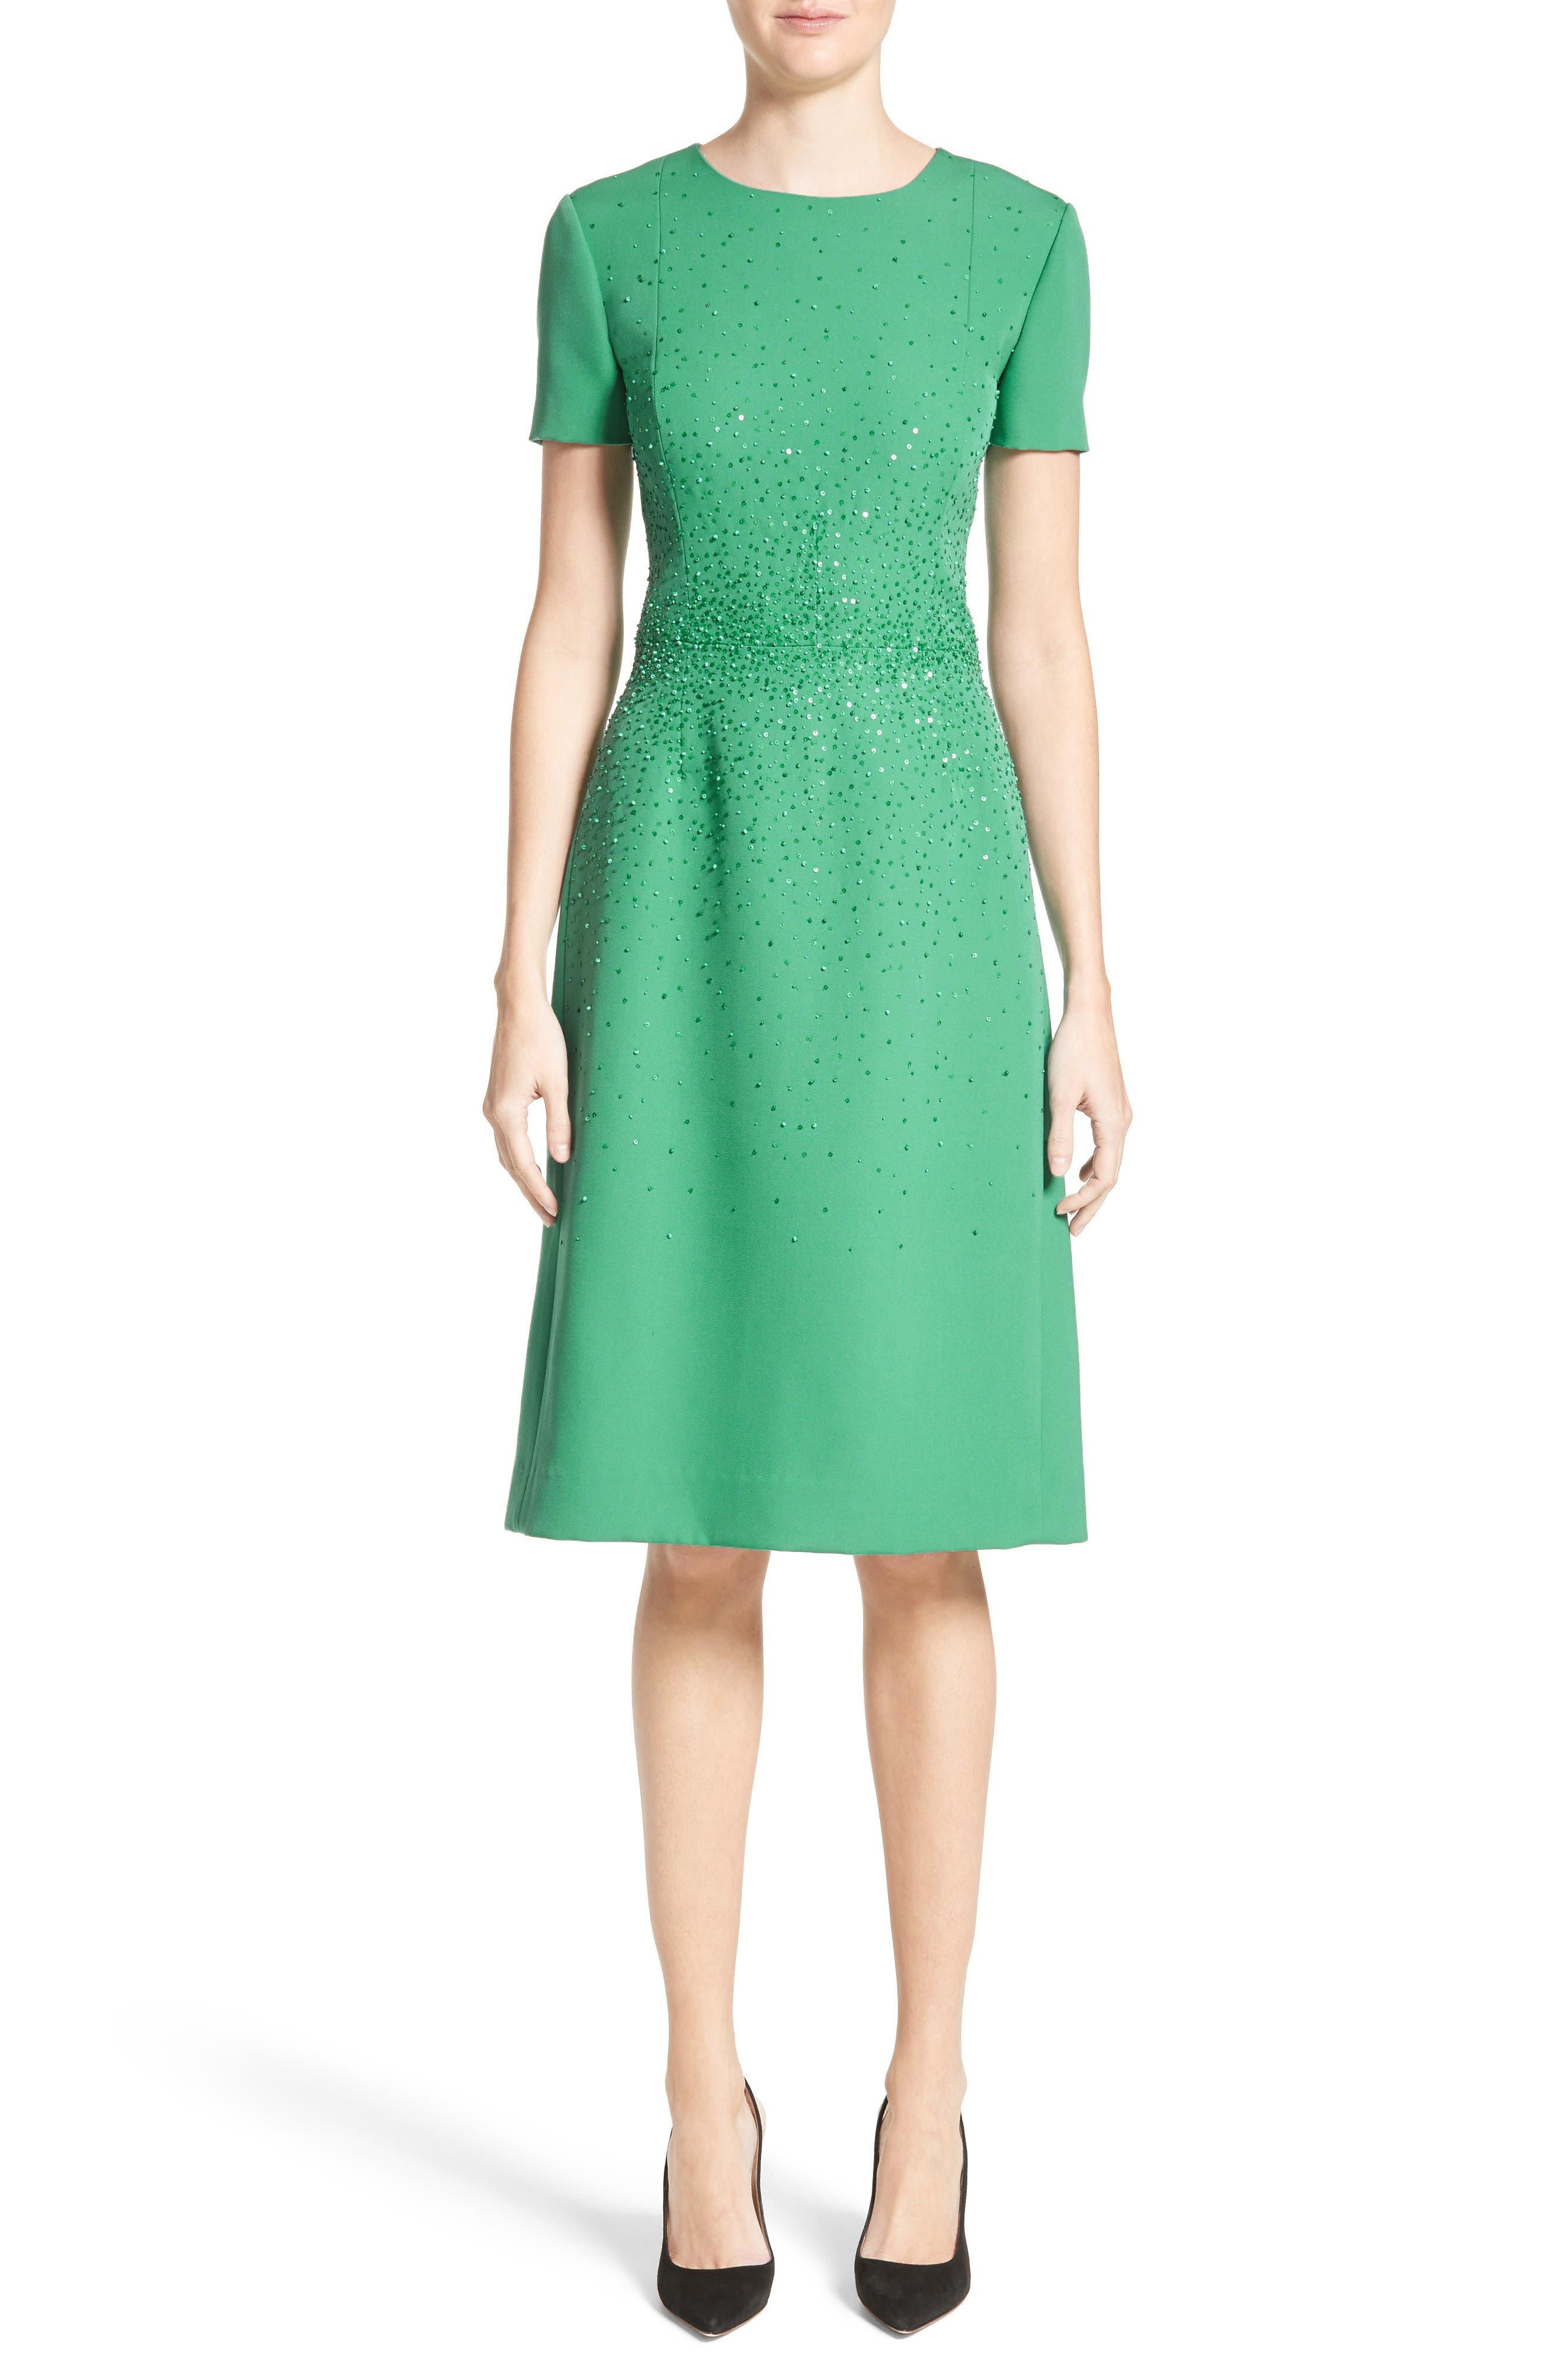 Main Image - Carolina Herrera Beaded Stretch Wool Dress